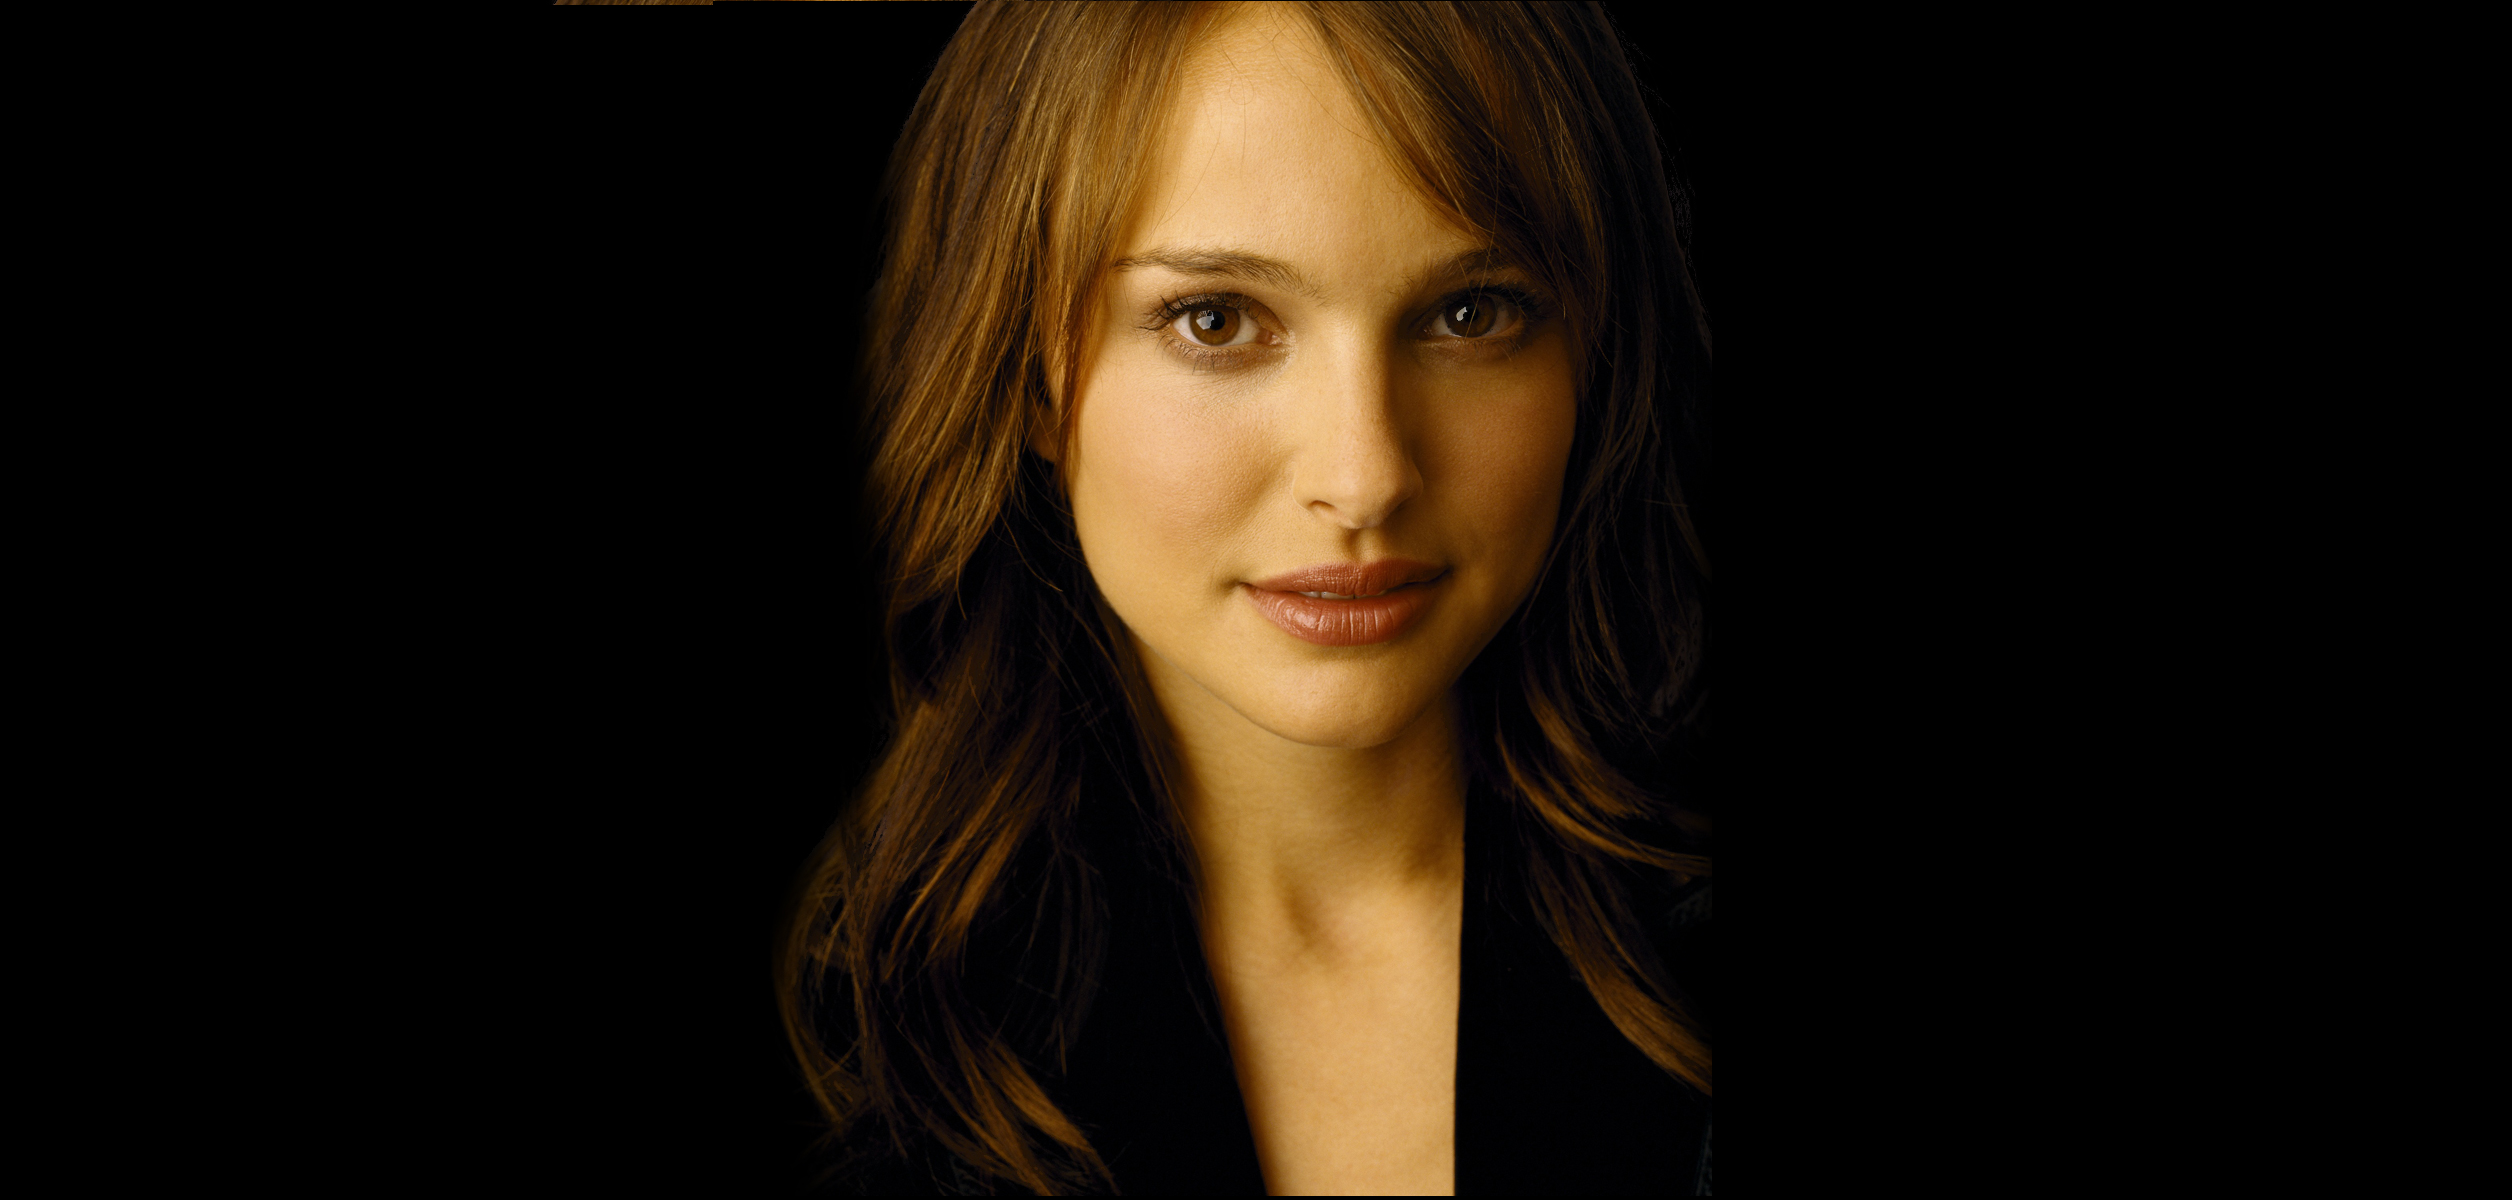 Celebridades Fondos De: Natalie Portman Full HD Fondo De Pantalla And Fondo De